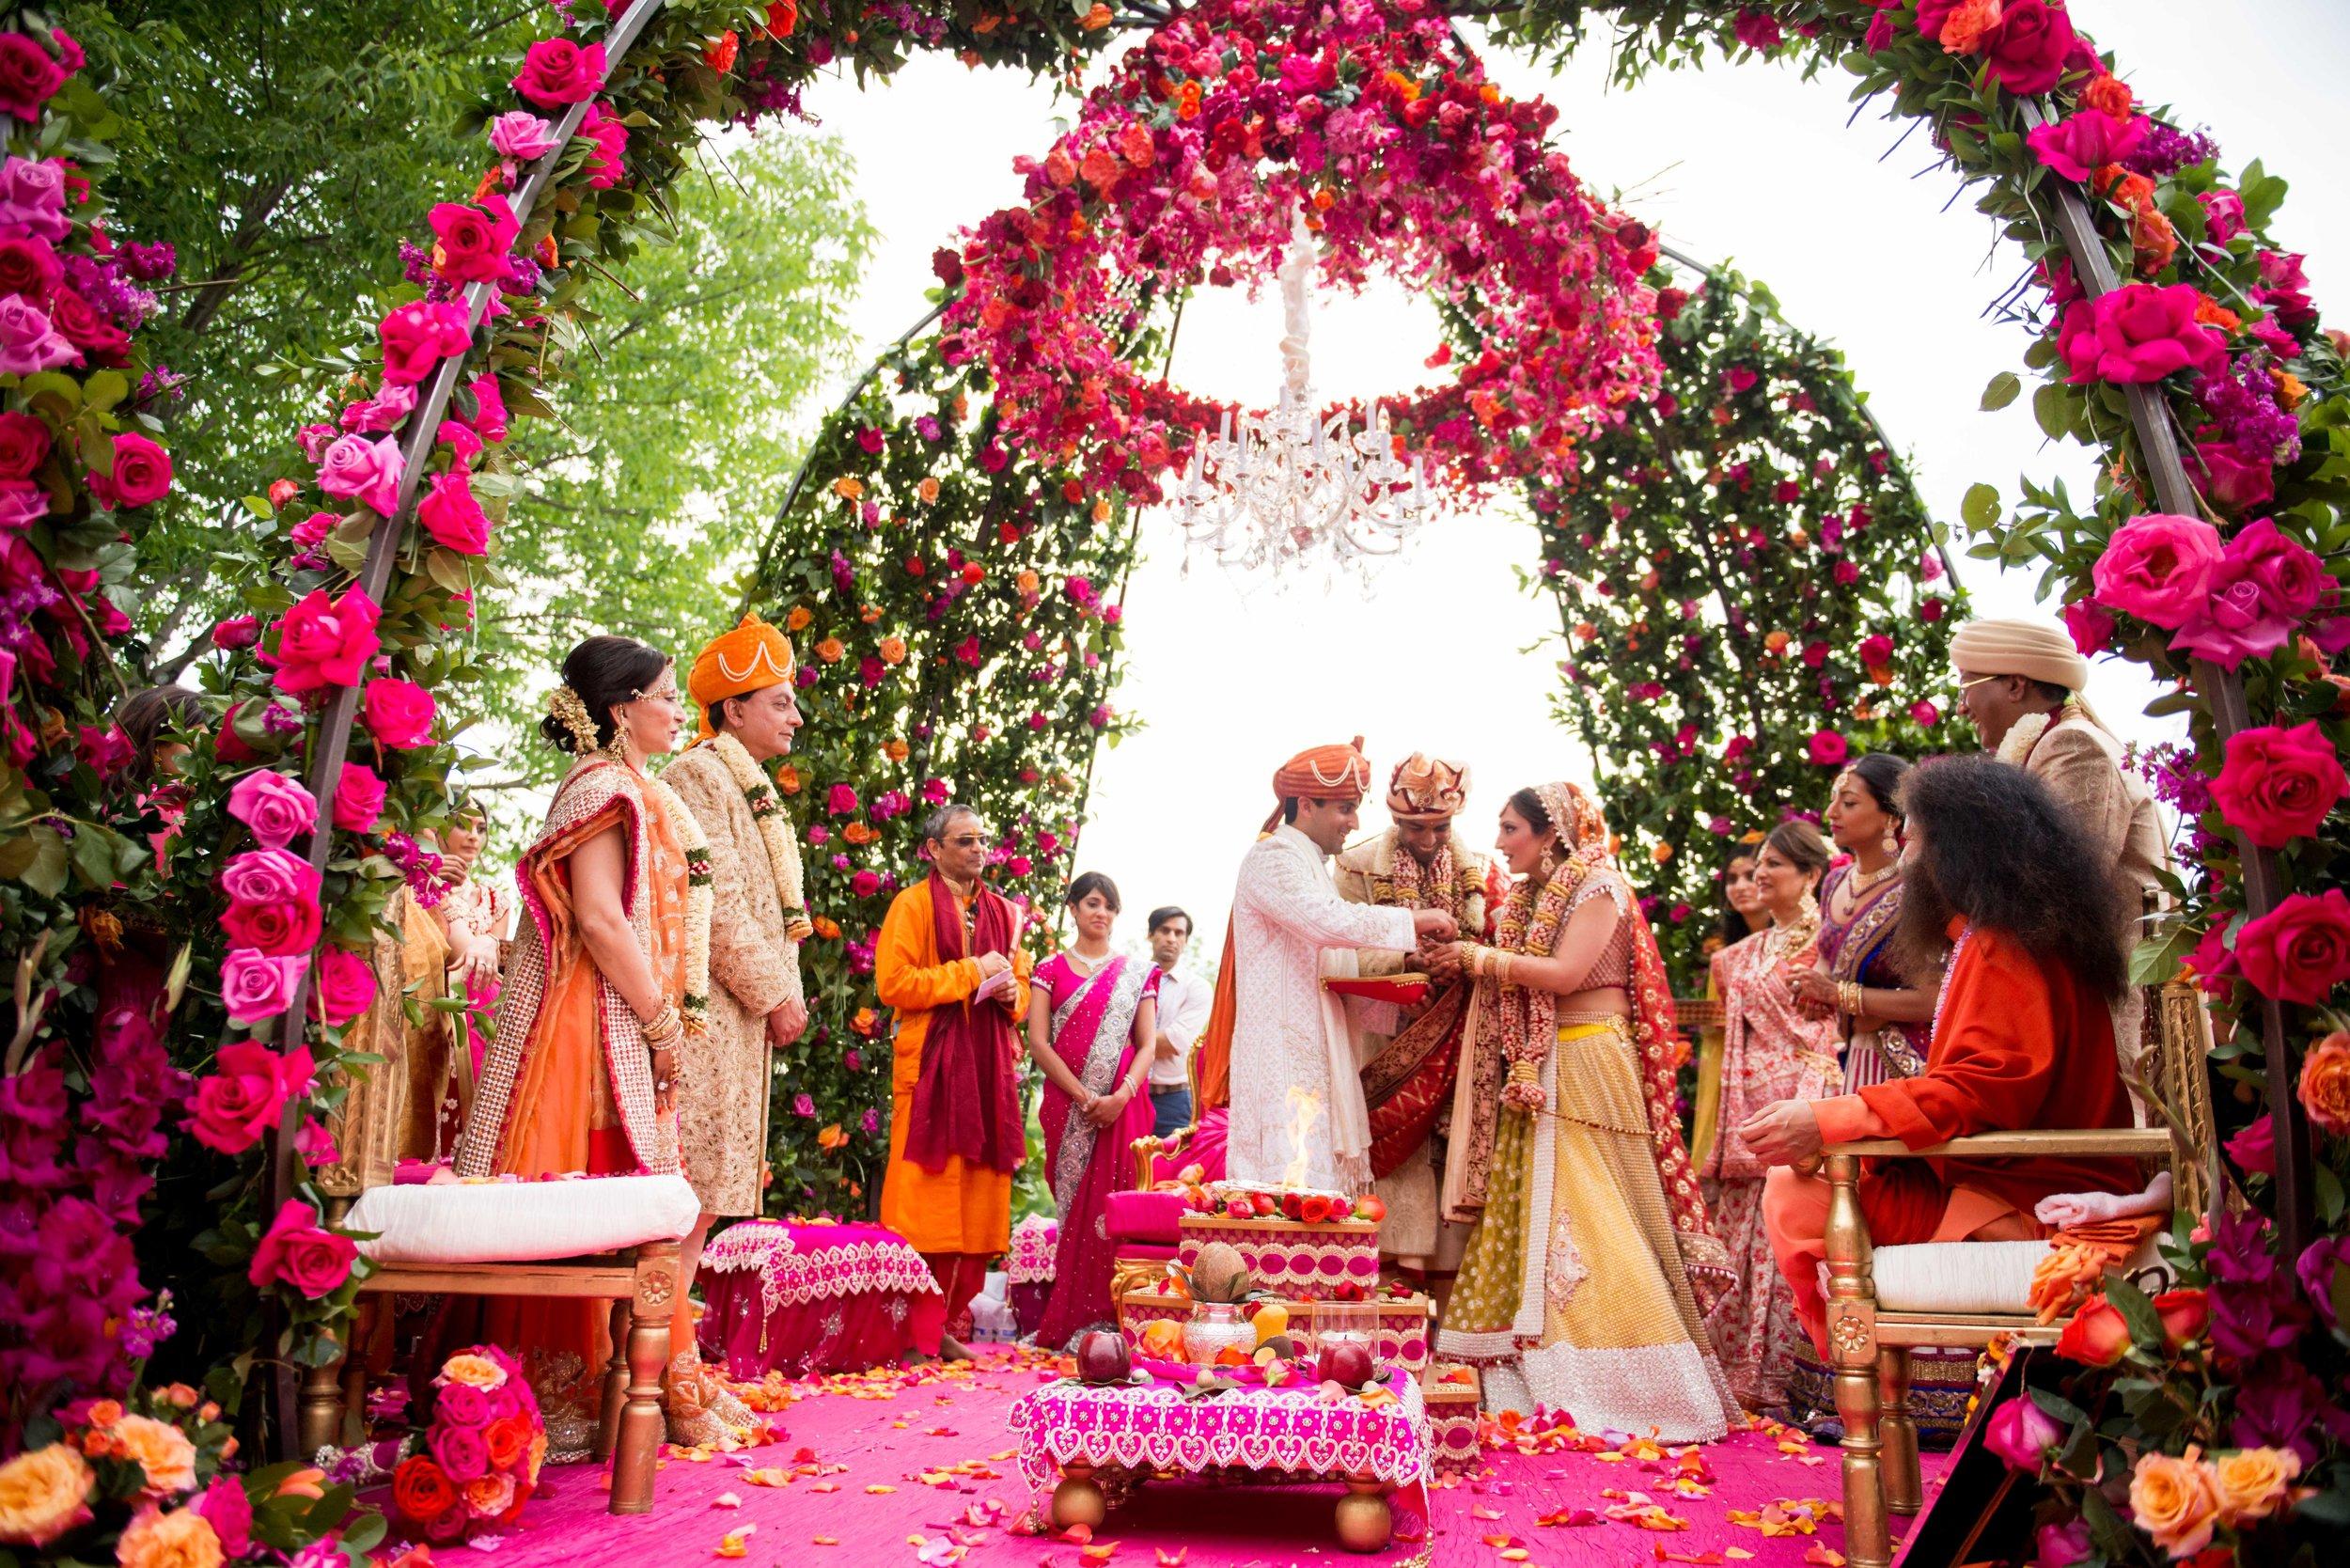 louisville-weddings-purvi-jignesh-01.jpg